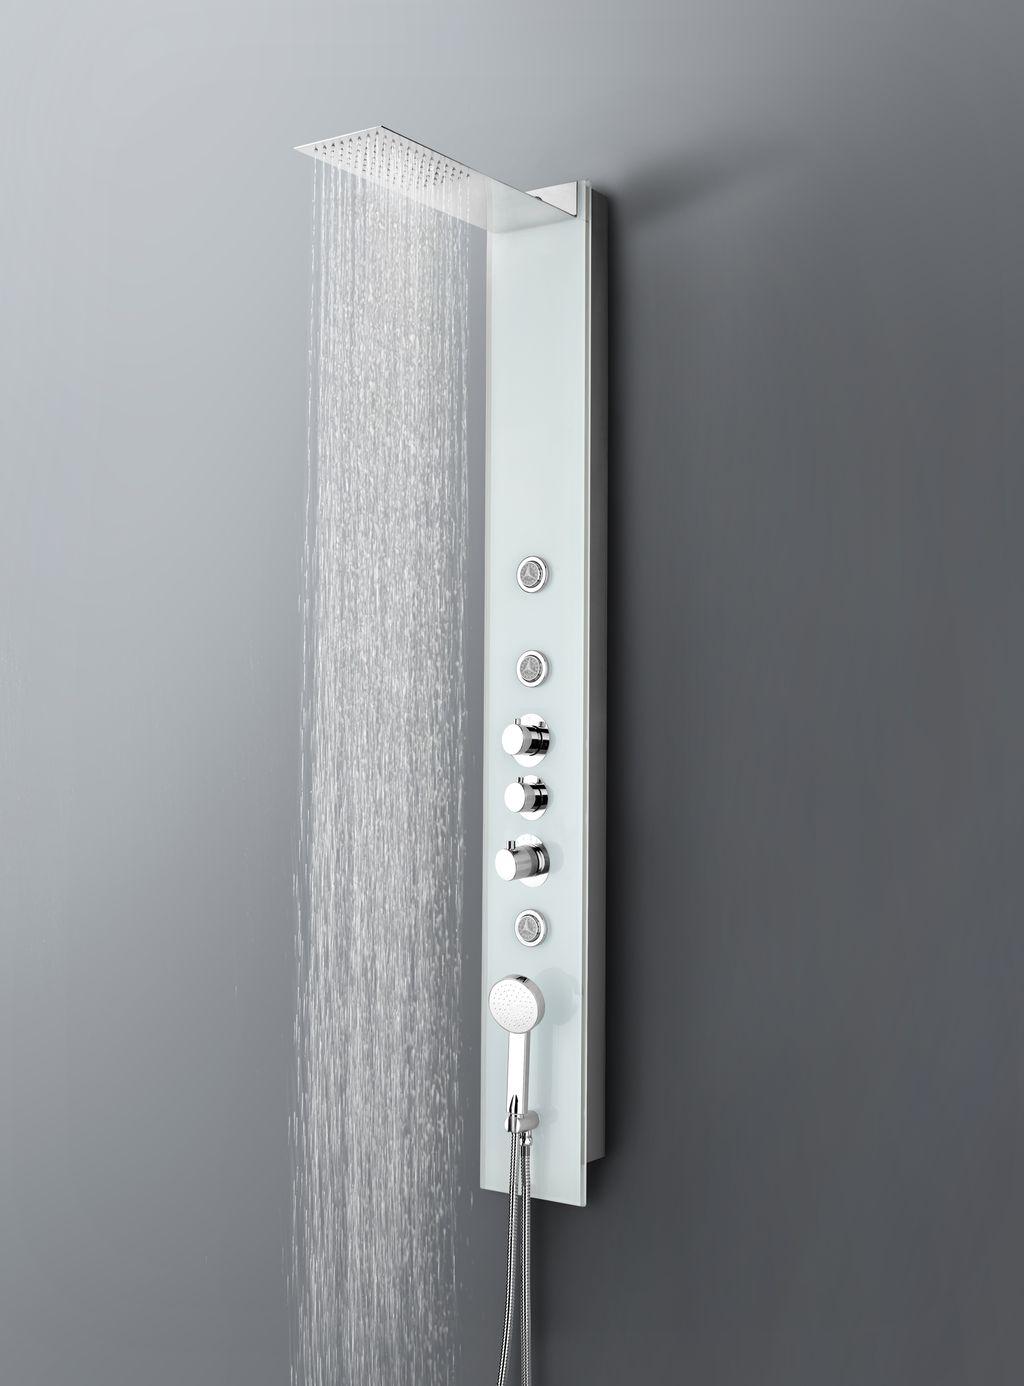 dusch paneel lp095 edelstahl duschs ule brause dusche sedal thermostat ebay. Black Bedroom Furniture Sets. Home Design Ideas